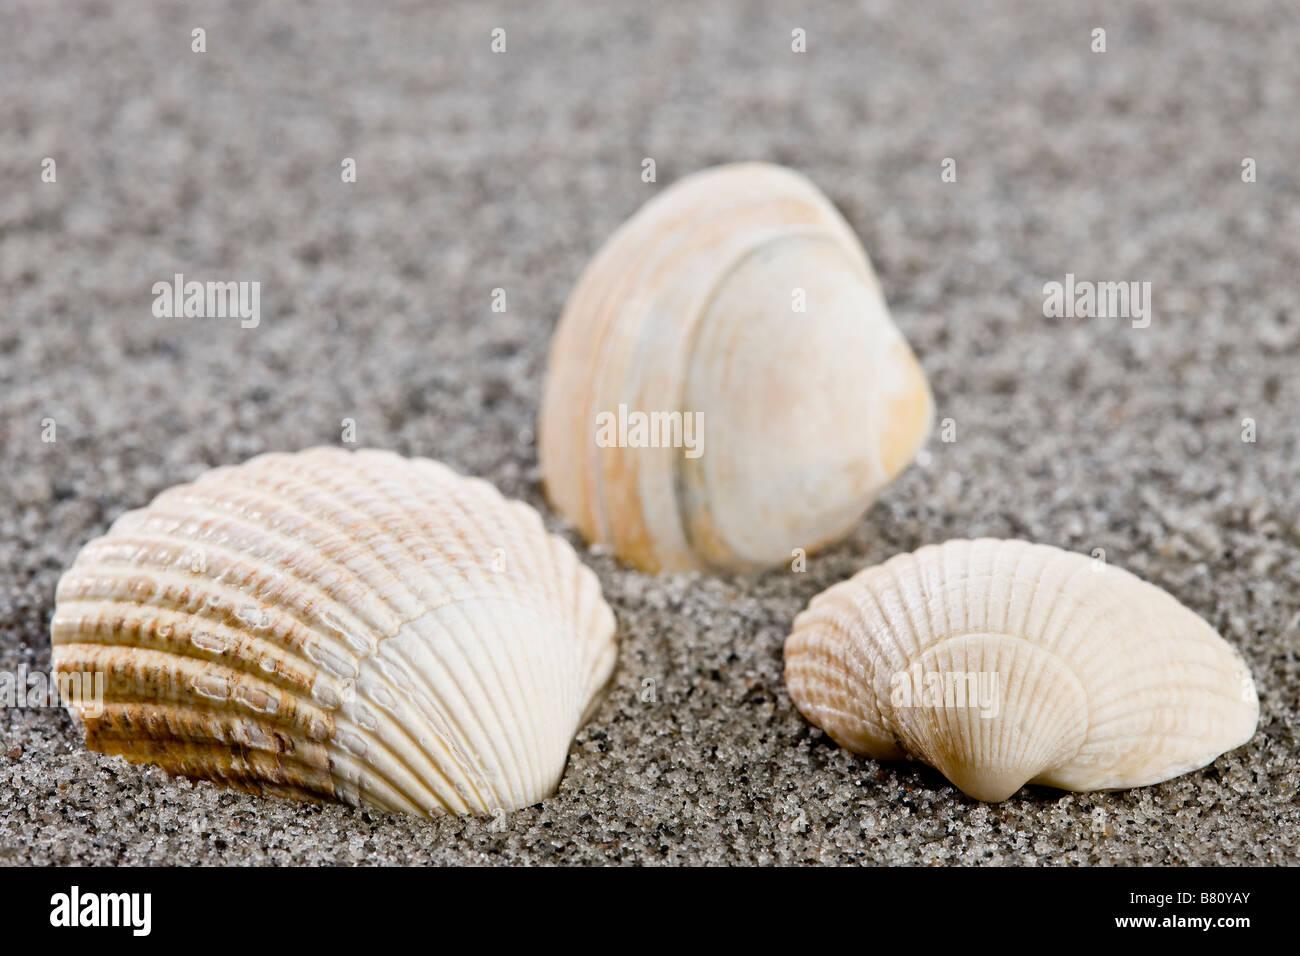 Shells on the beach - Stock Image